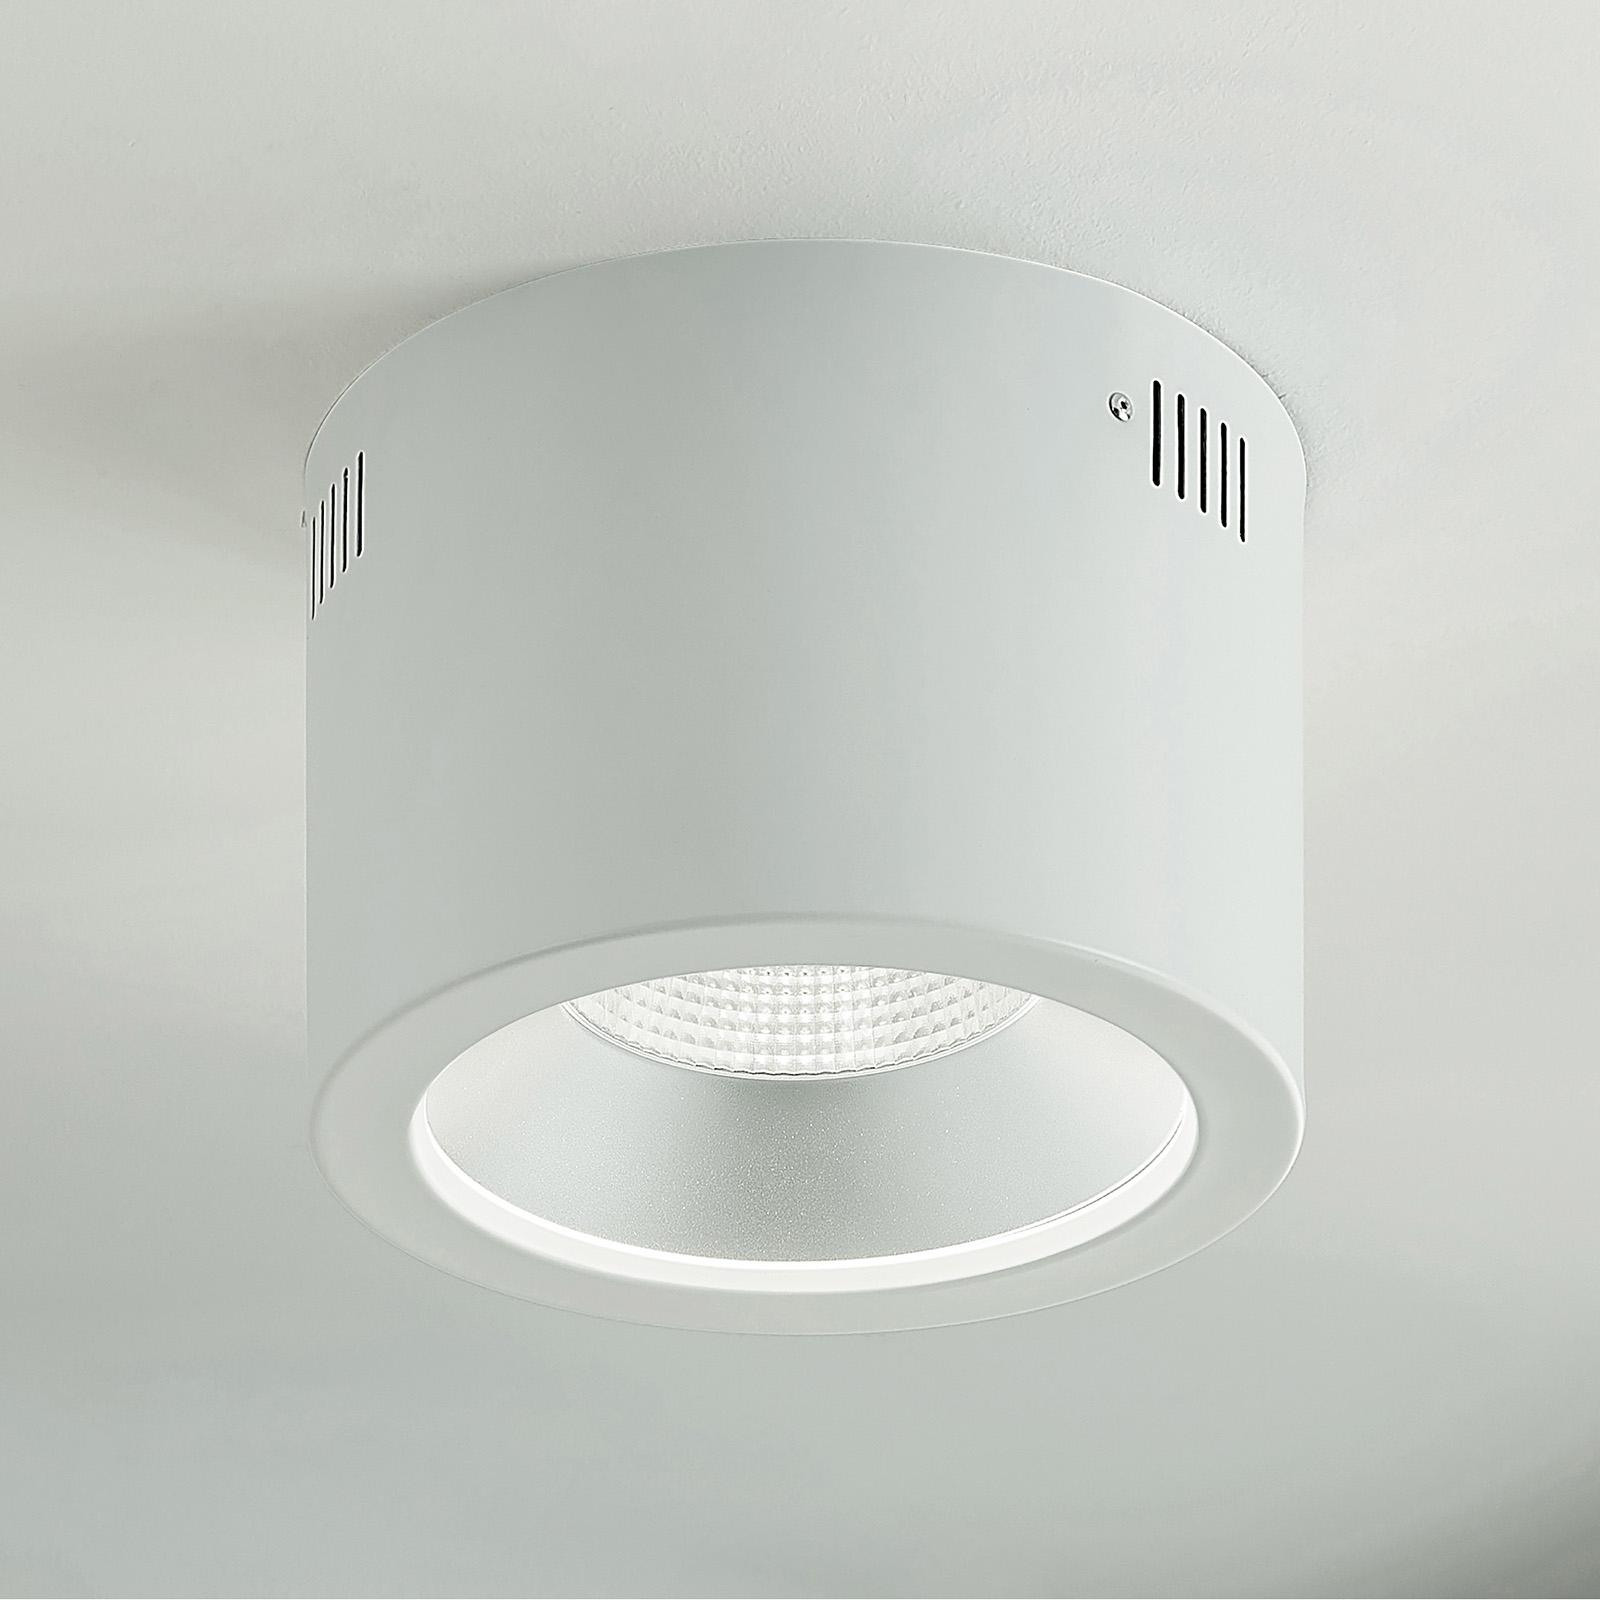 Arcchio Liddy -LED-alasvalo, valkoinen, Ø 23,2 cm